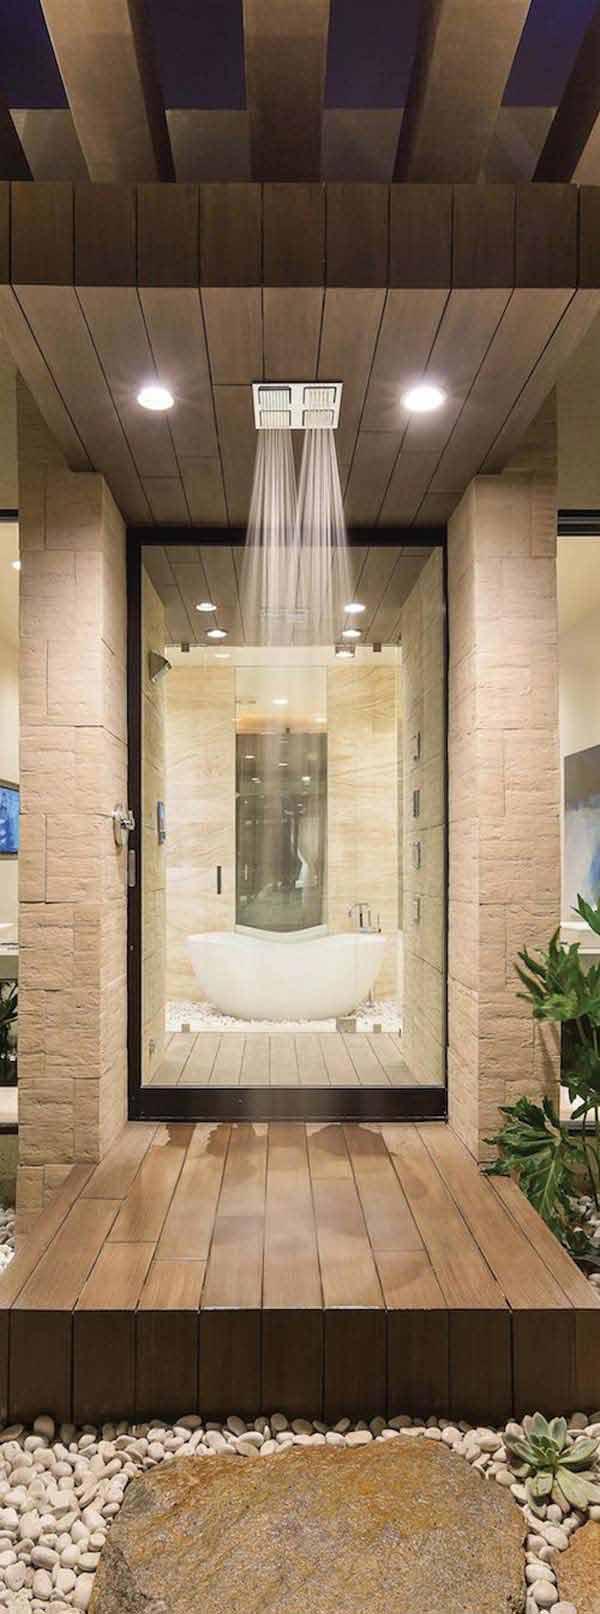 AD-Rain-Showers-Bathroom-Ideas-23